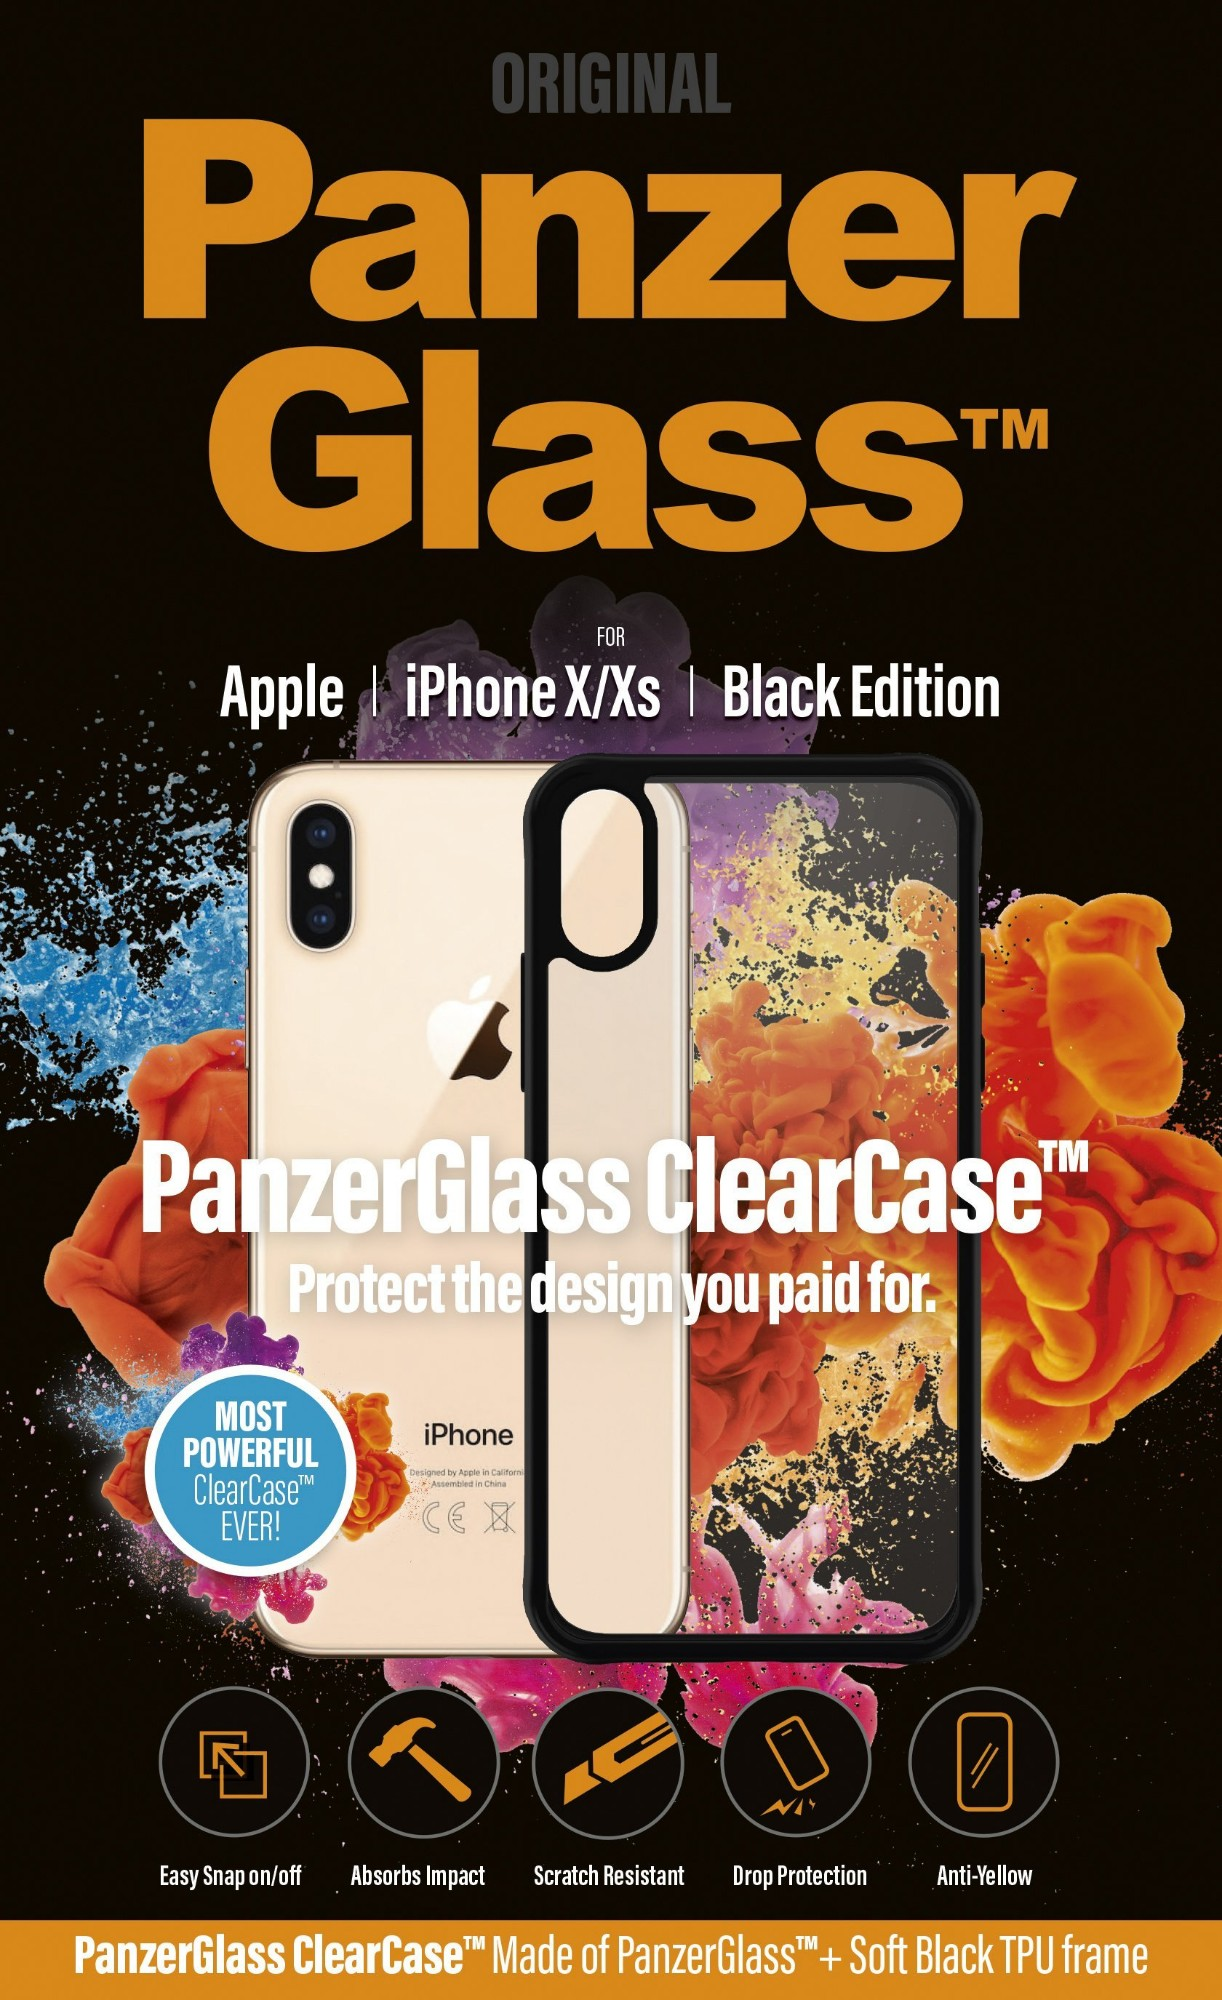 "PanzerGlass 0219 mobile phone case 14.7 cm (5.8"") Cover Black,Transparent"